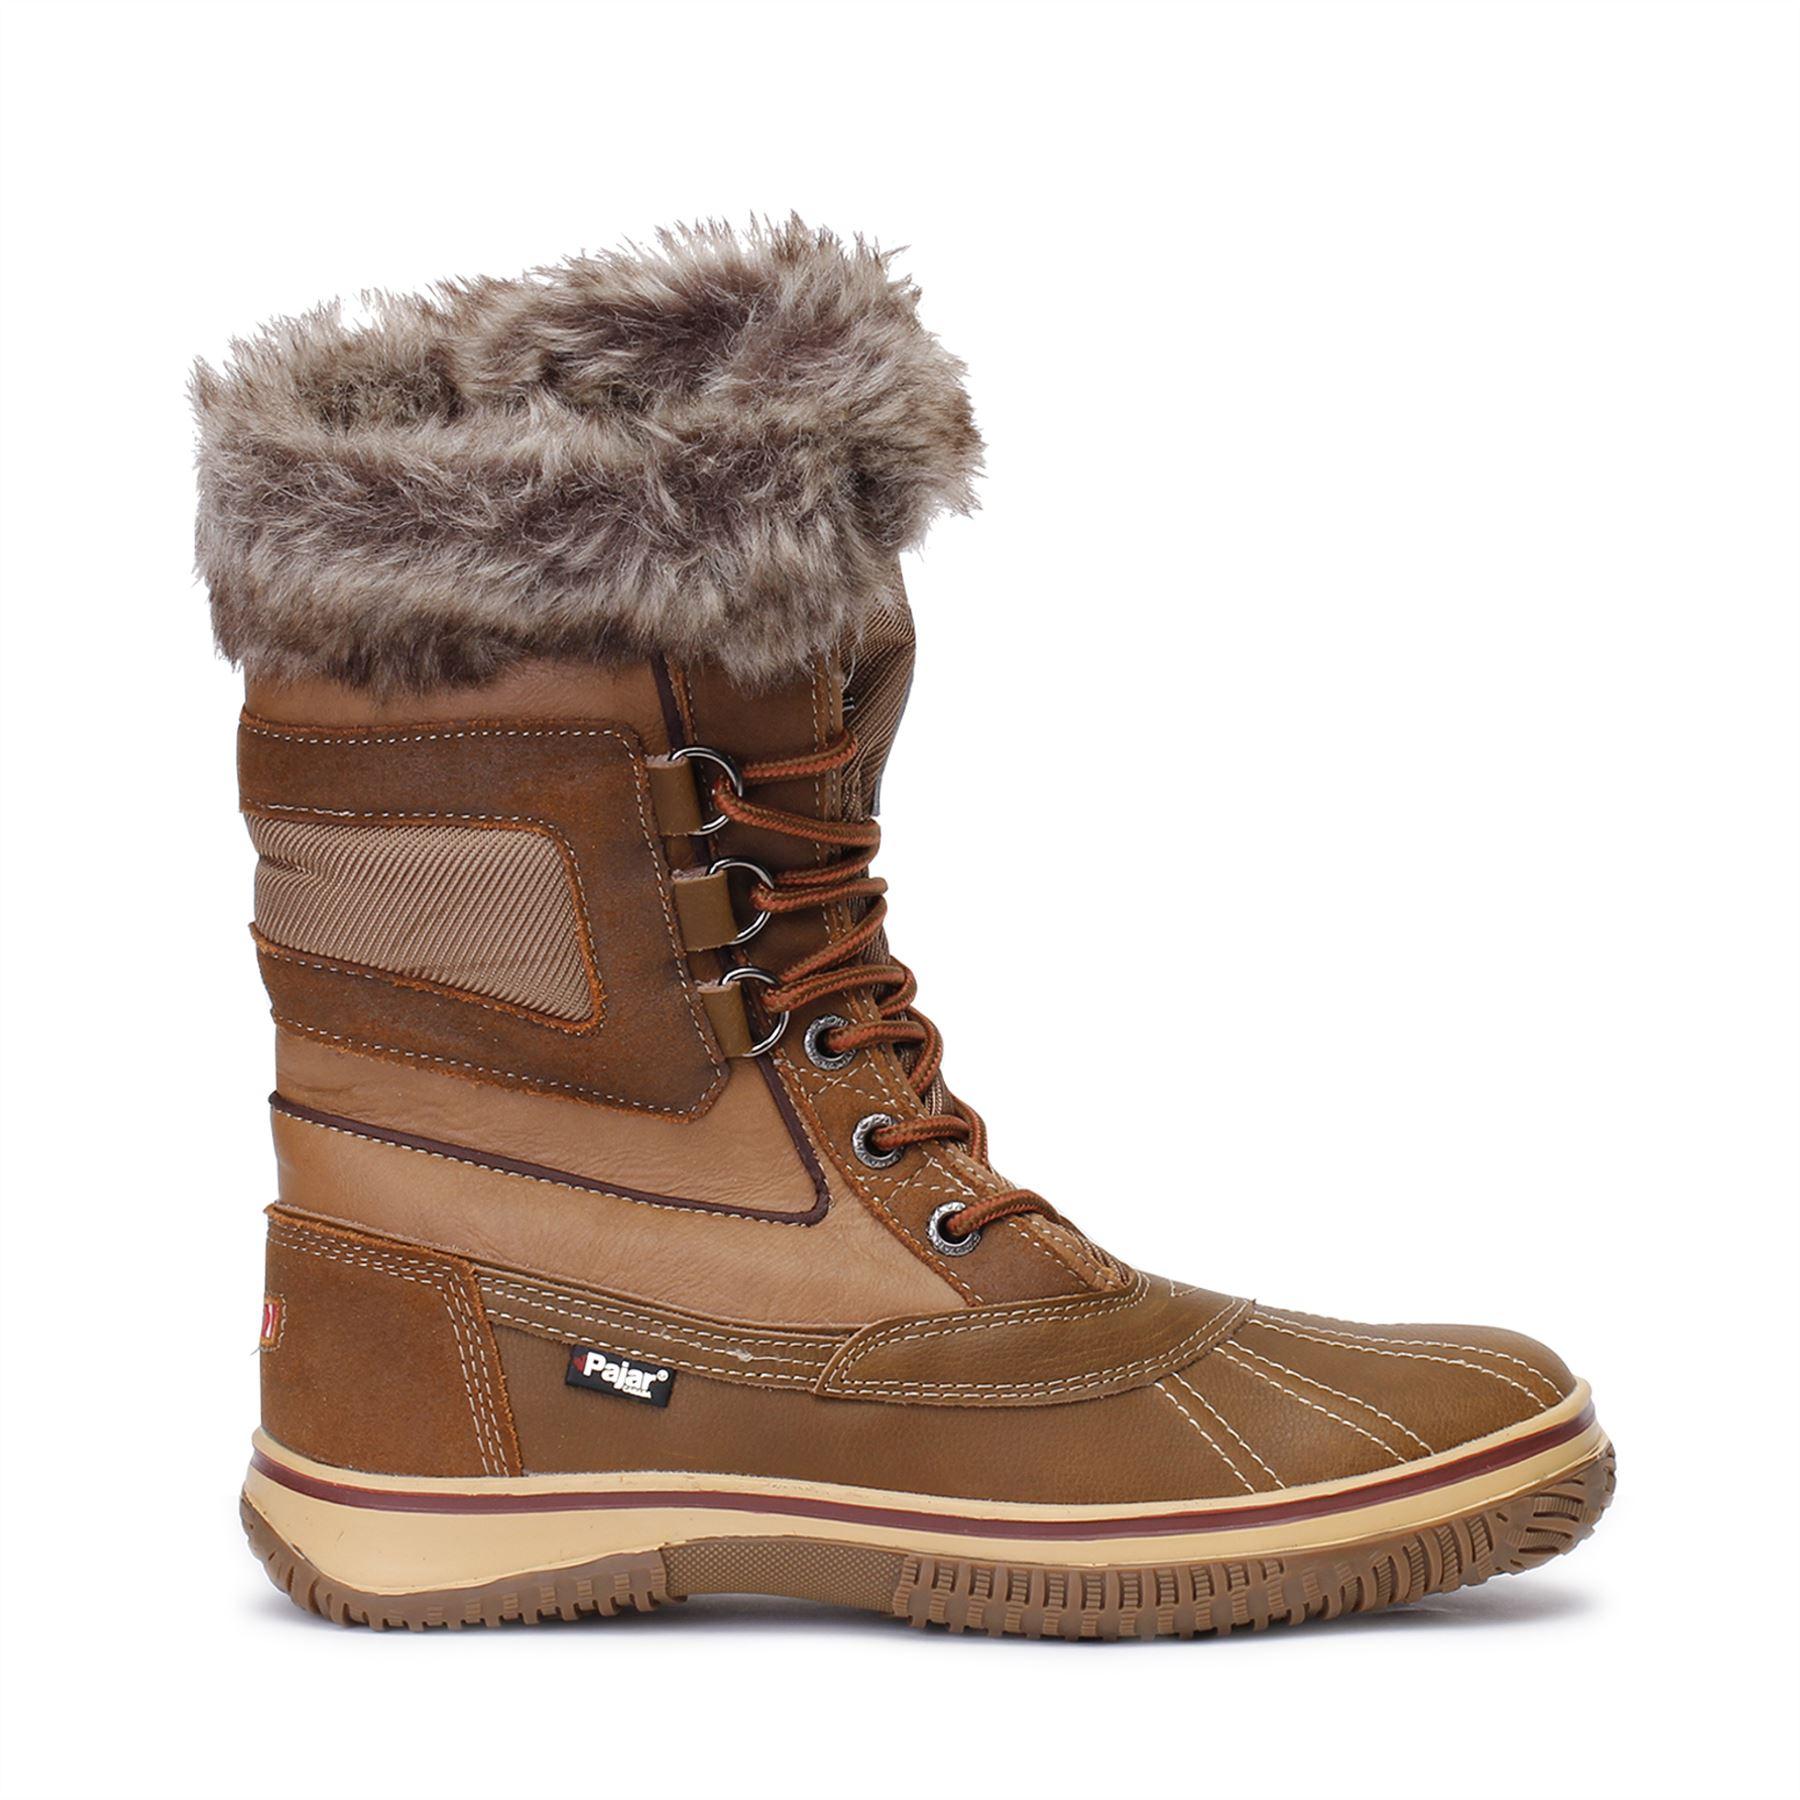 pajar boots pajar-canada-mens-tuscan-snow-boots-lined-waterproof- OUMWZYB